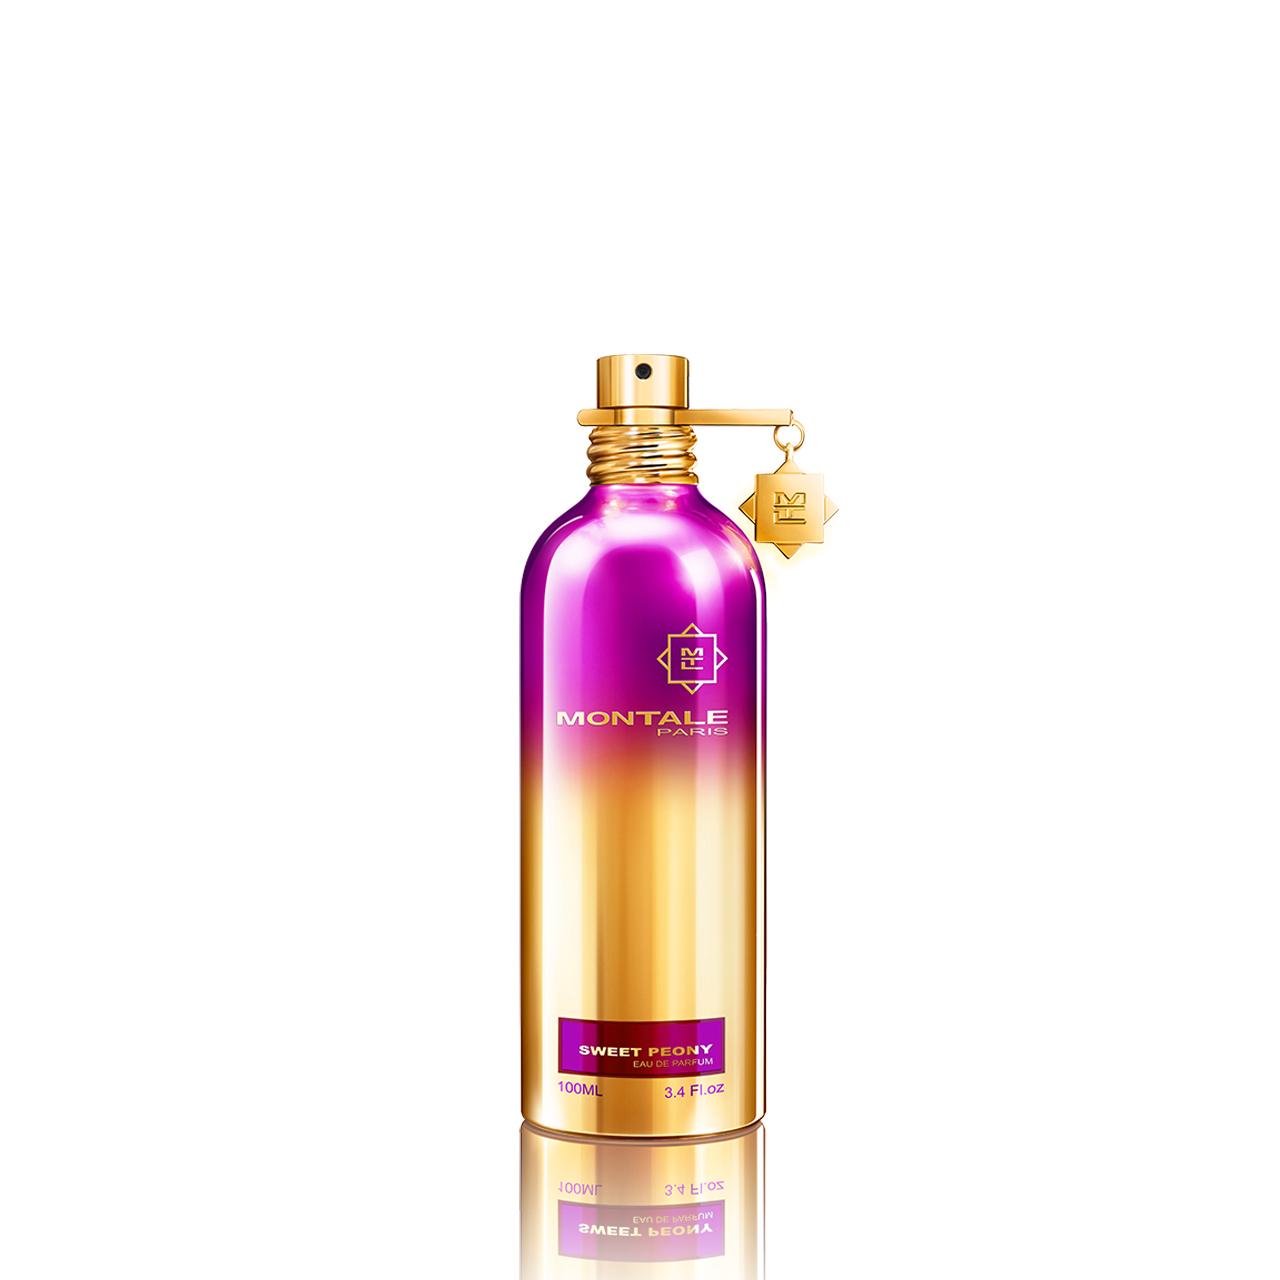 Sweet Peony - Eau de Parfum